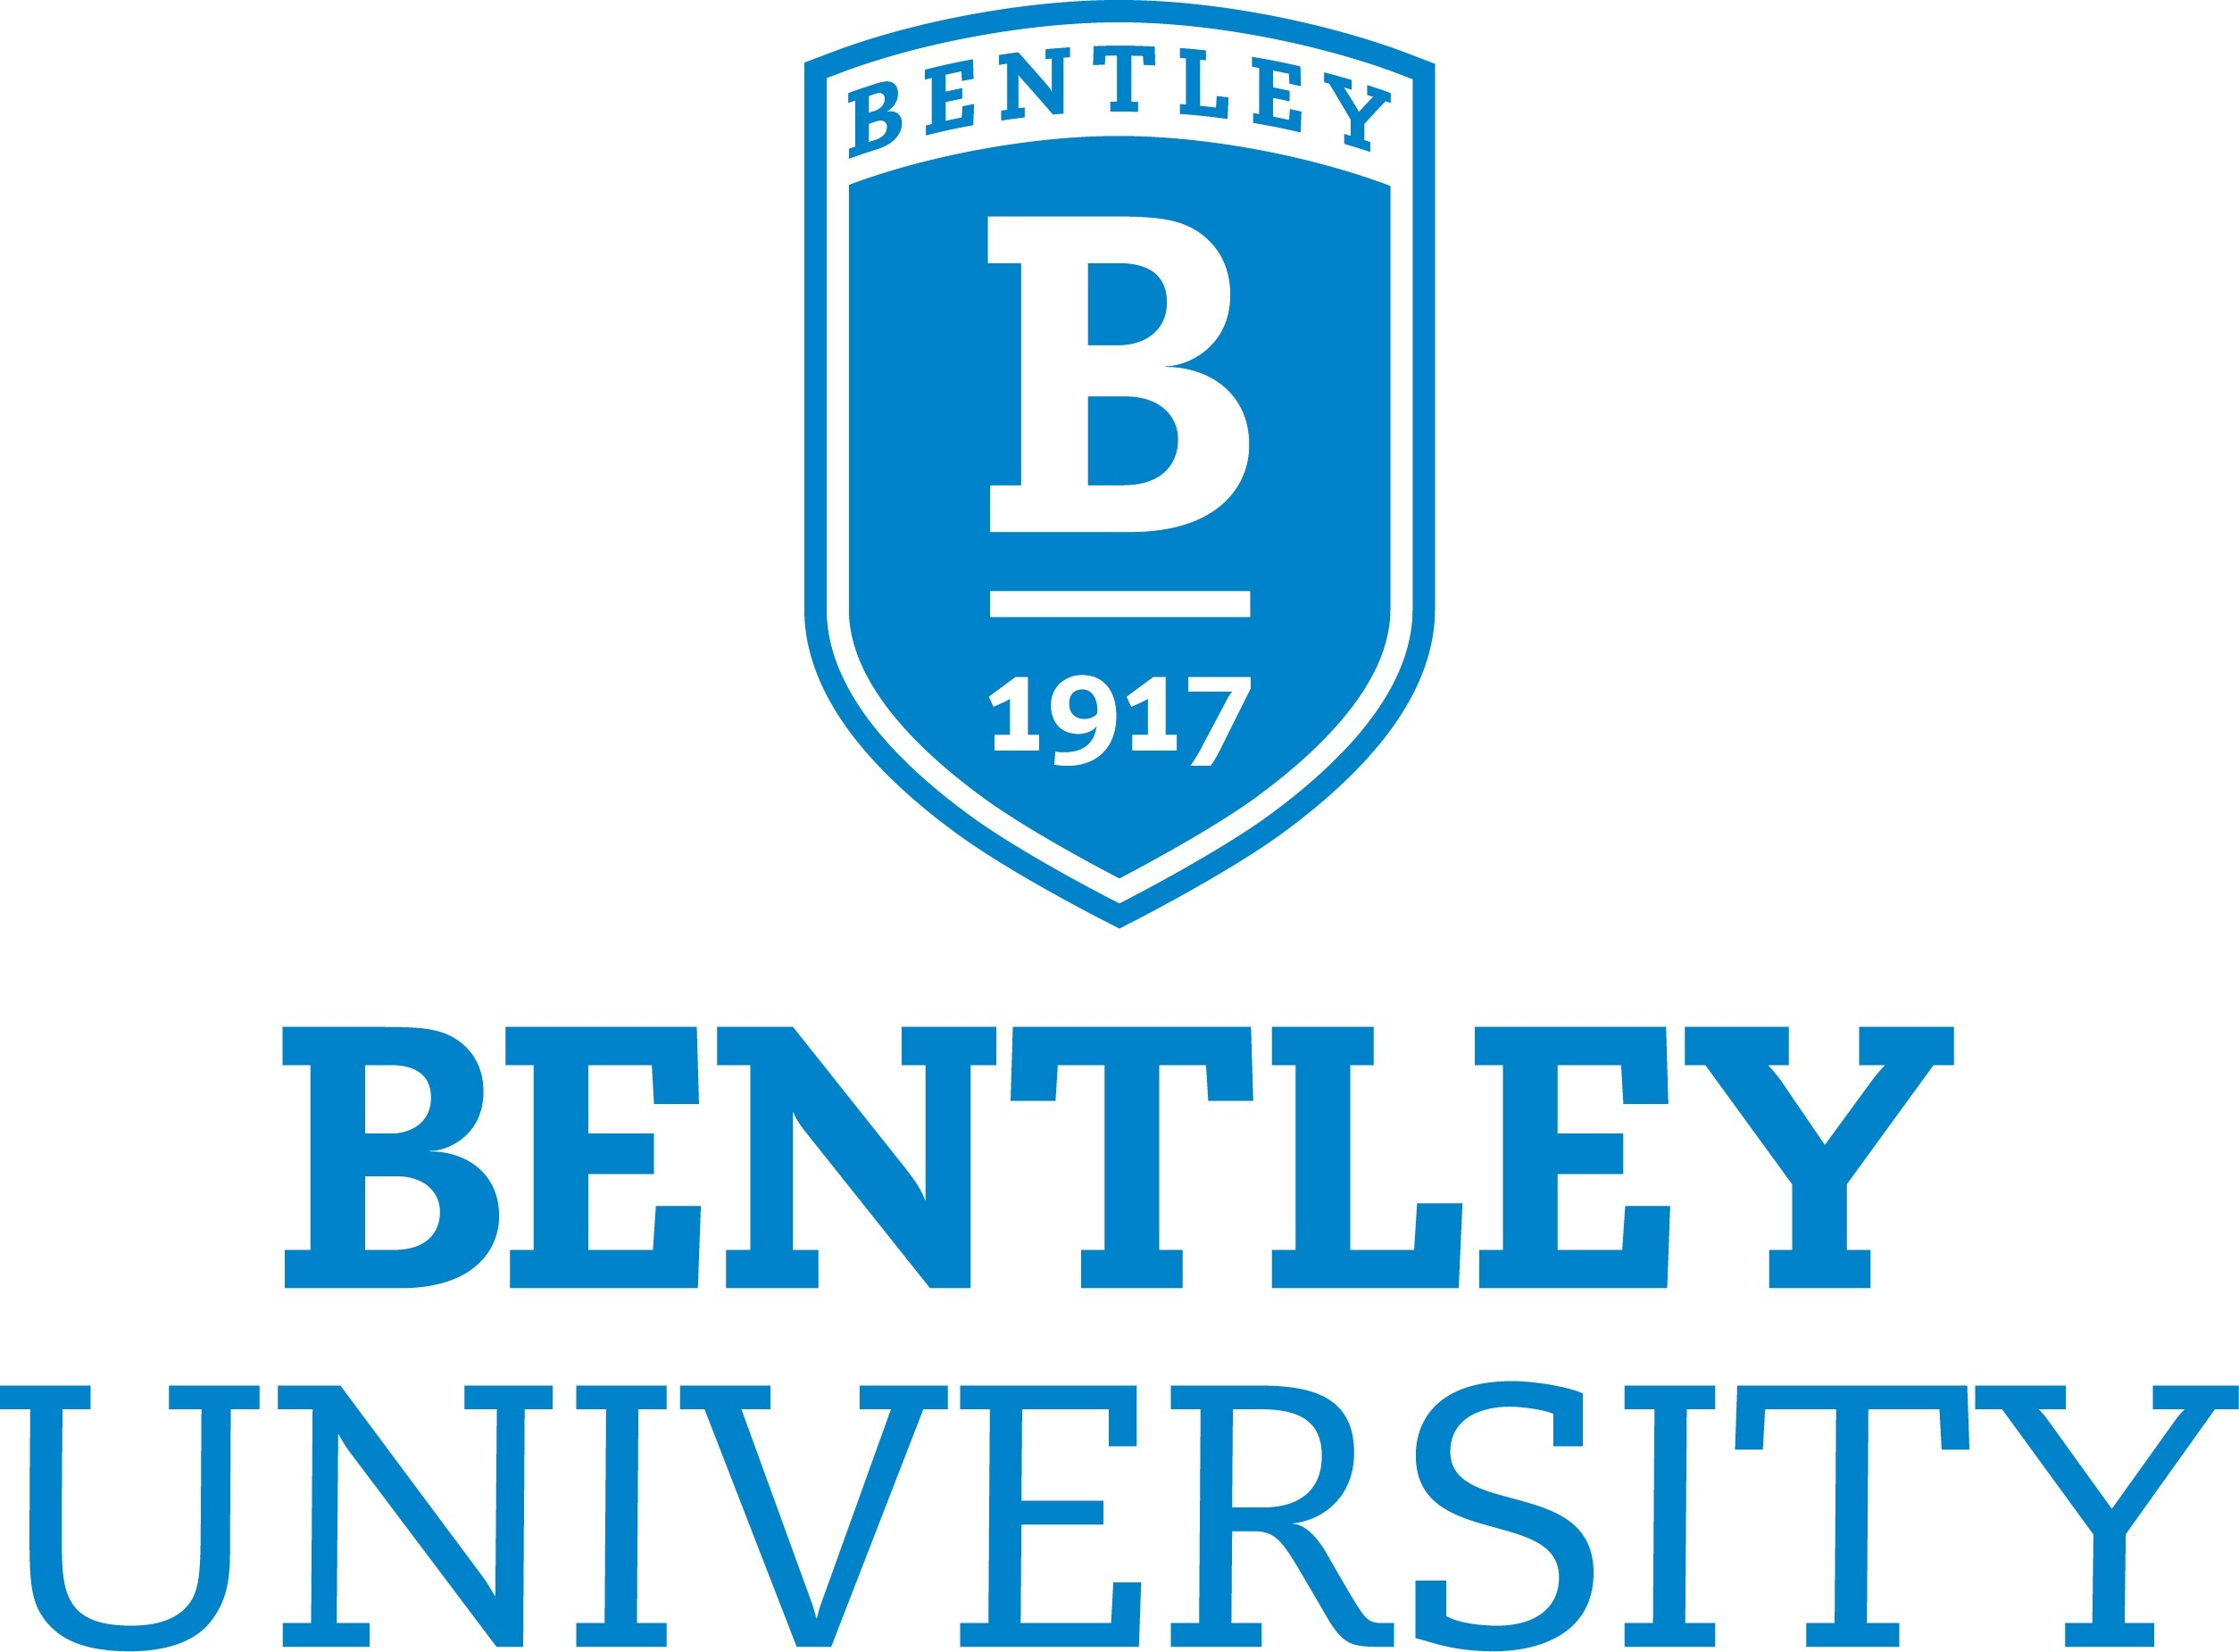 Bentley University Logo. (PRNewsFoto/Bentley University) (PRNewsFoto/)